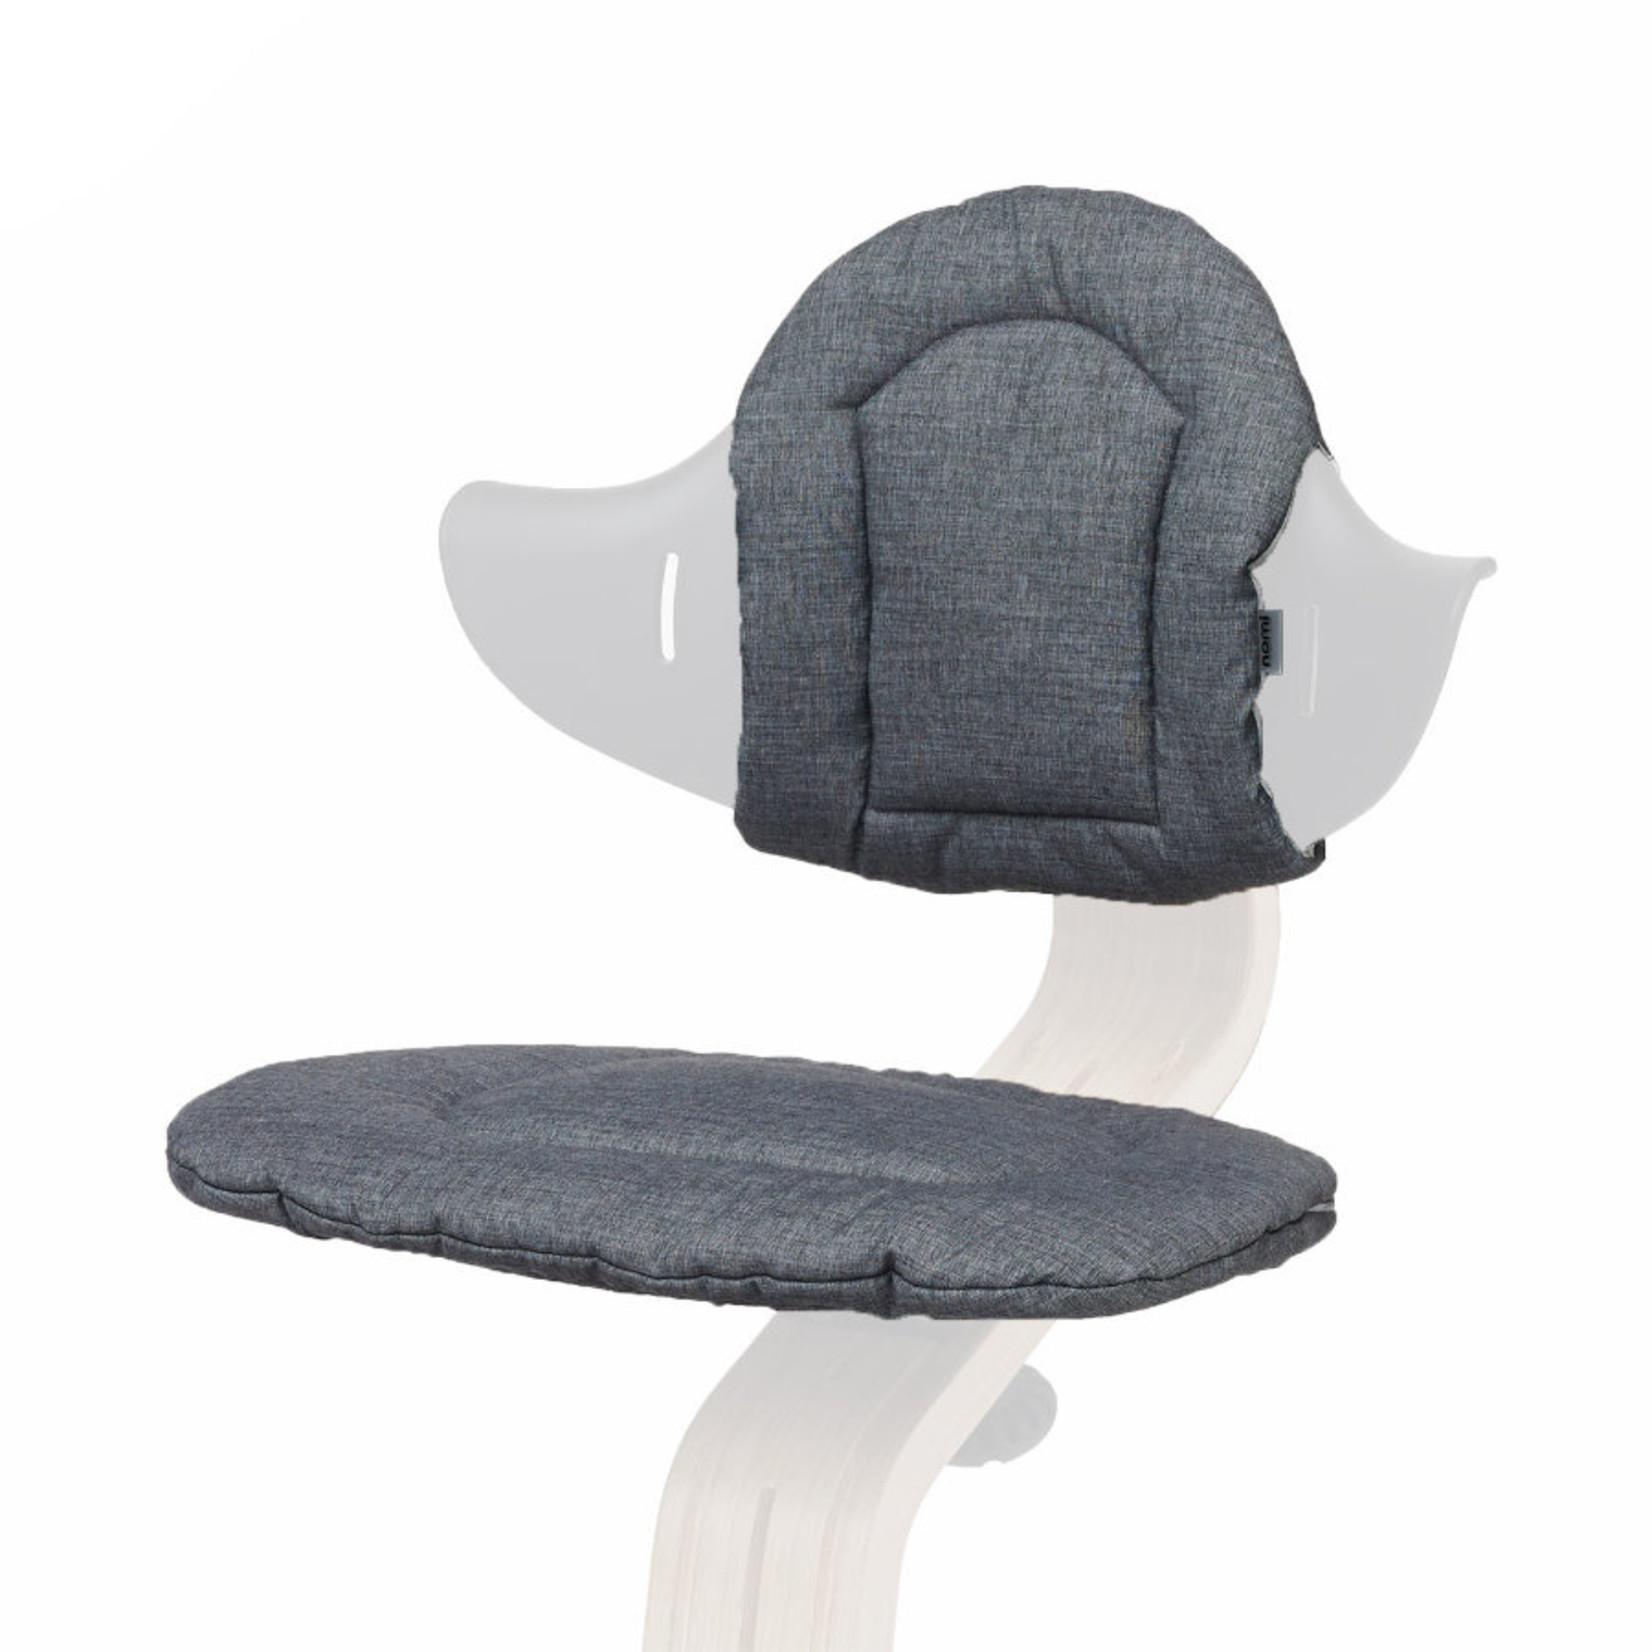 Nomi Nomi Cushion Dark grey (Zitkussentjes)